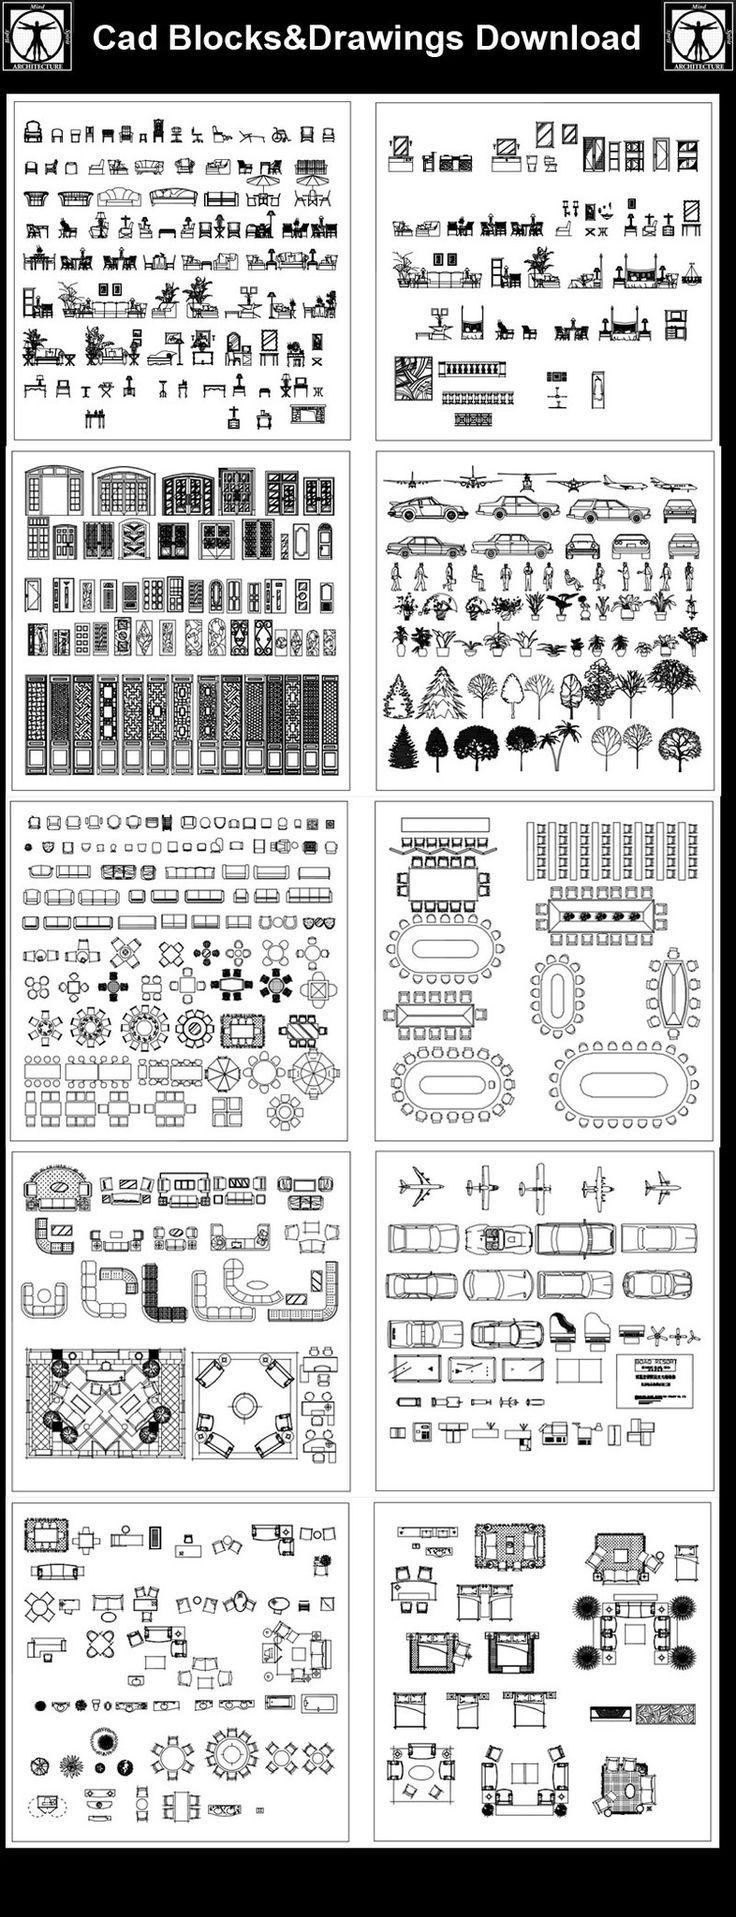 64 best sanoop chandran architecture images on Pinterest | Cad ...